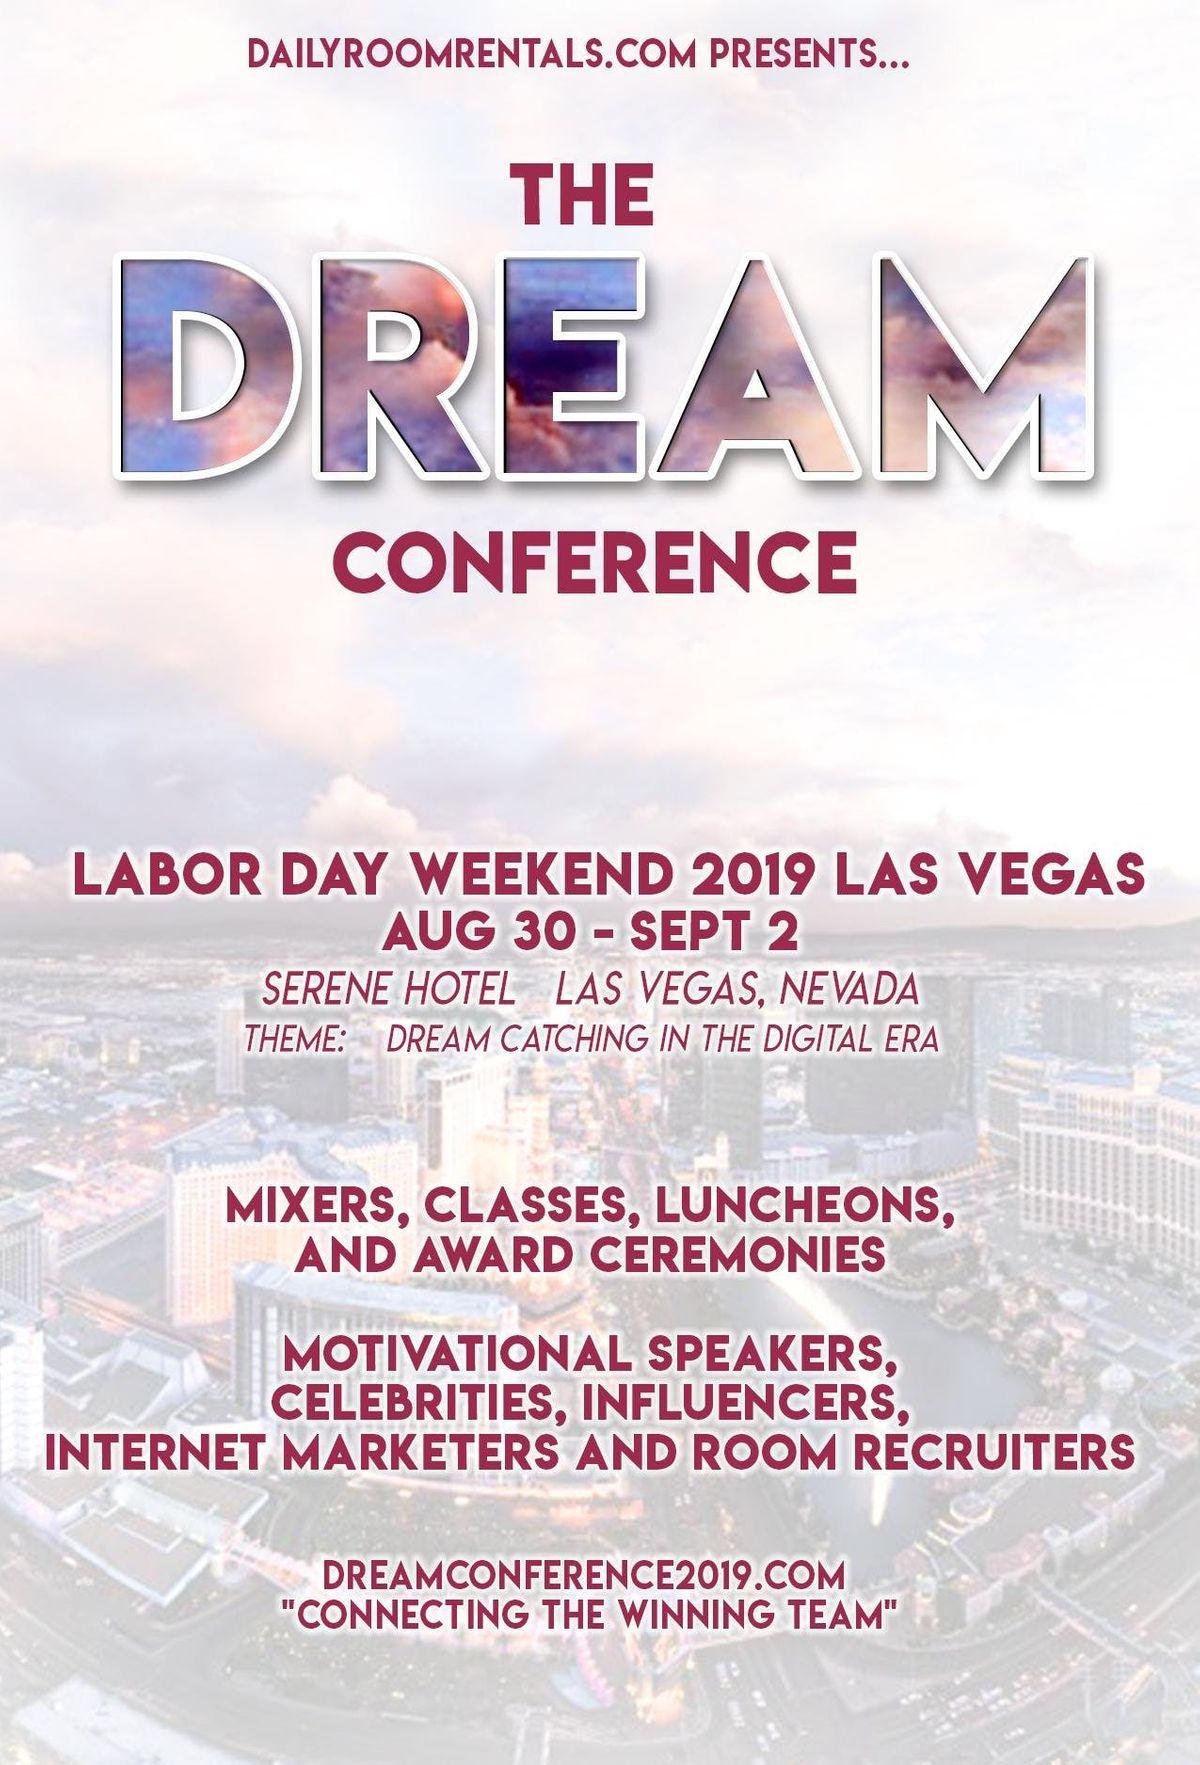 93 Conferences in Las Vegas 2019 | Summits in Las Vegas | LV events